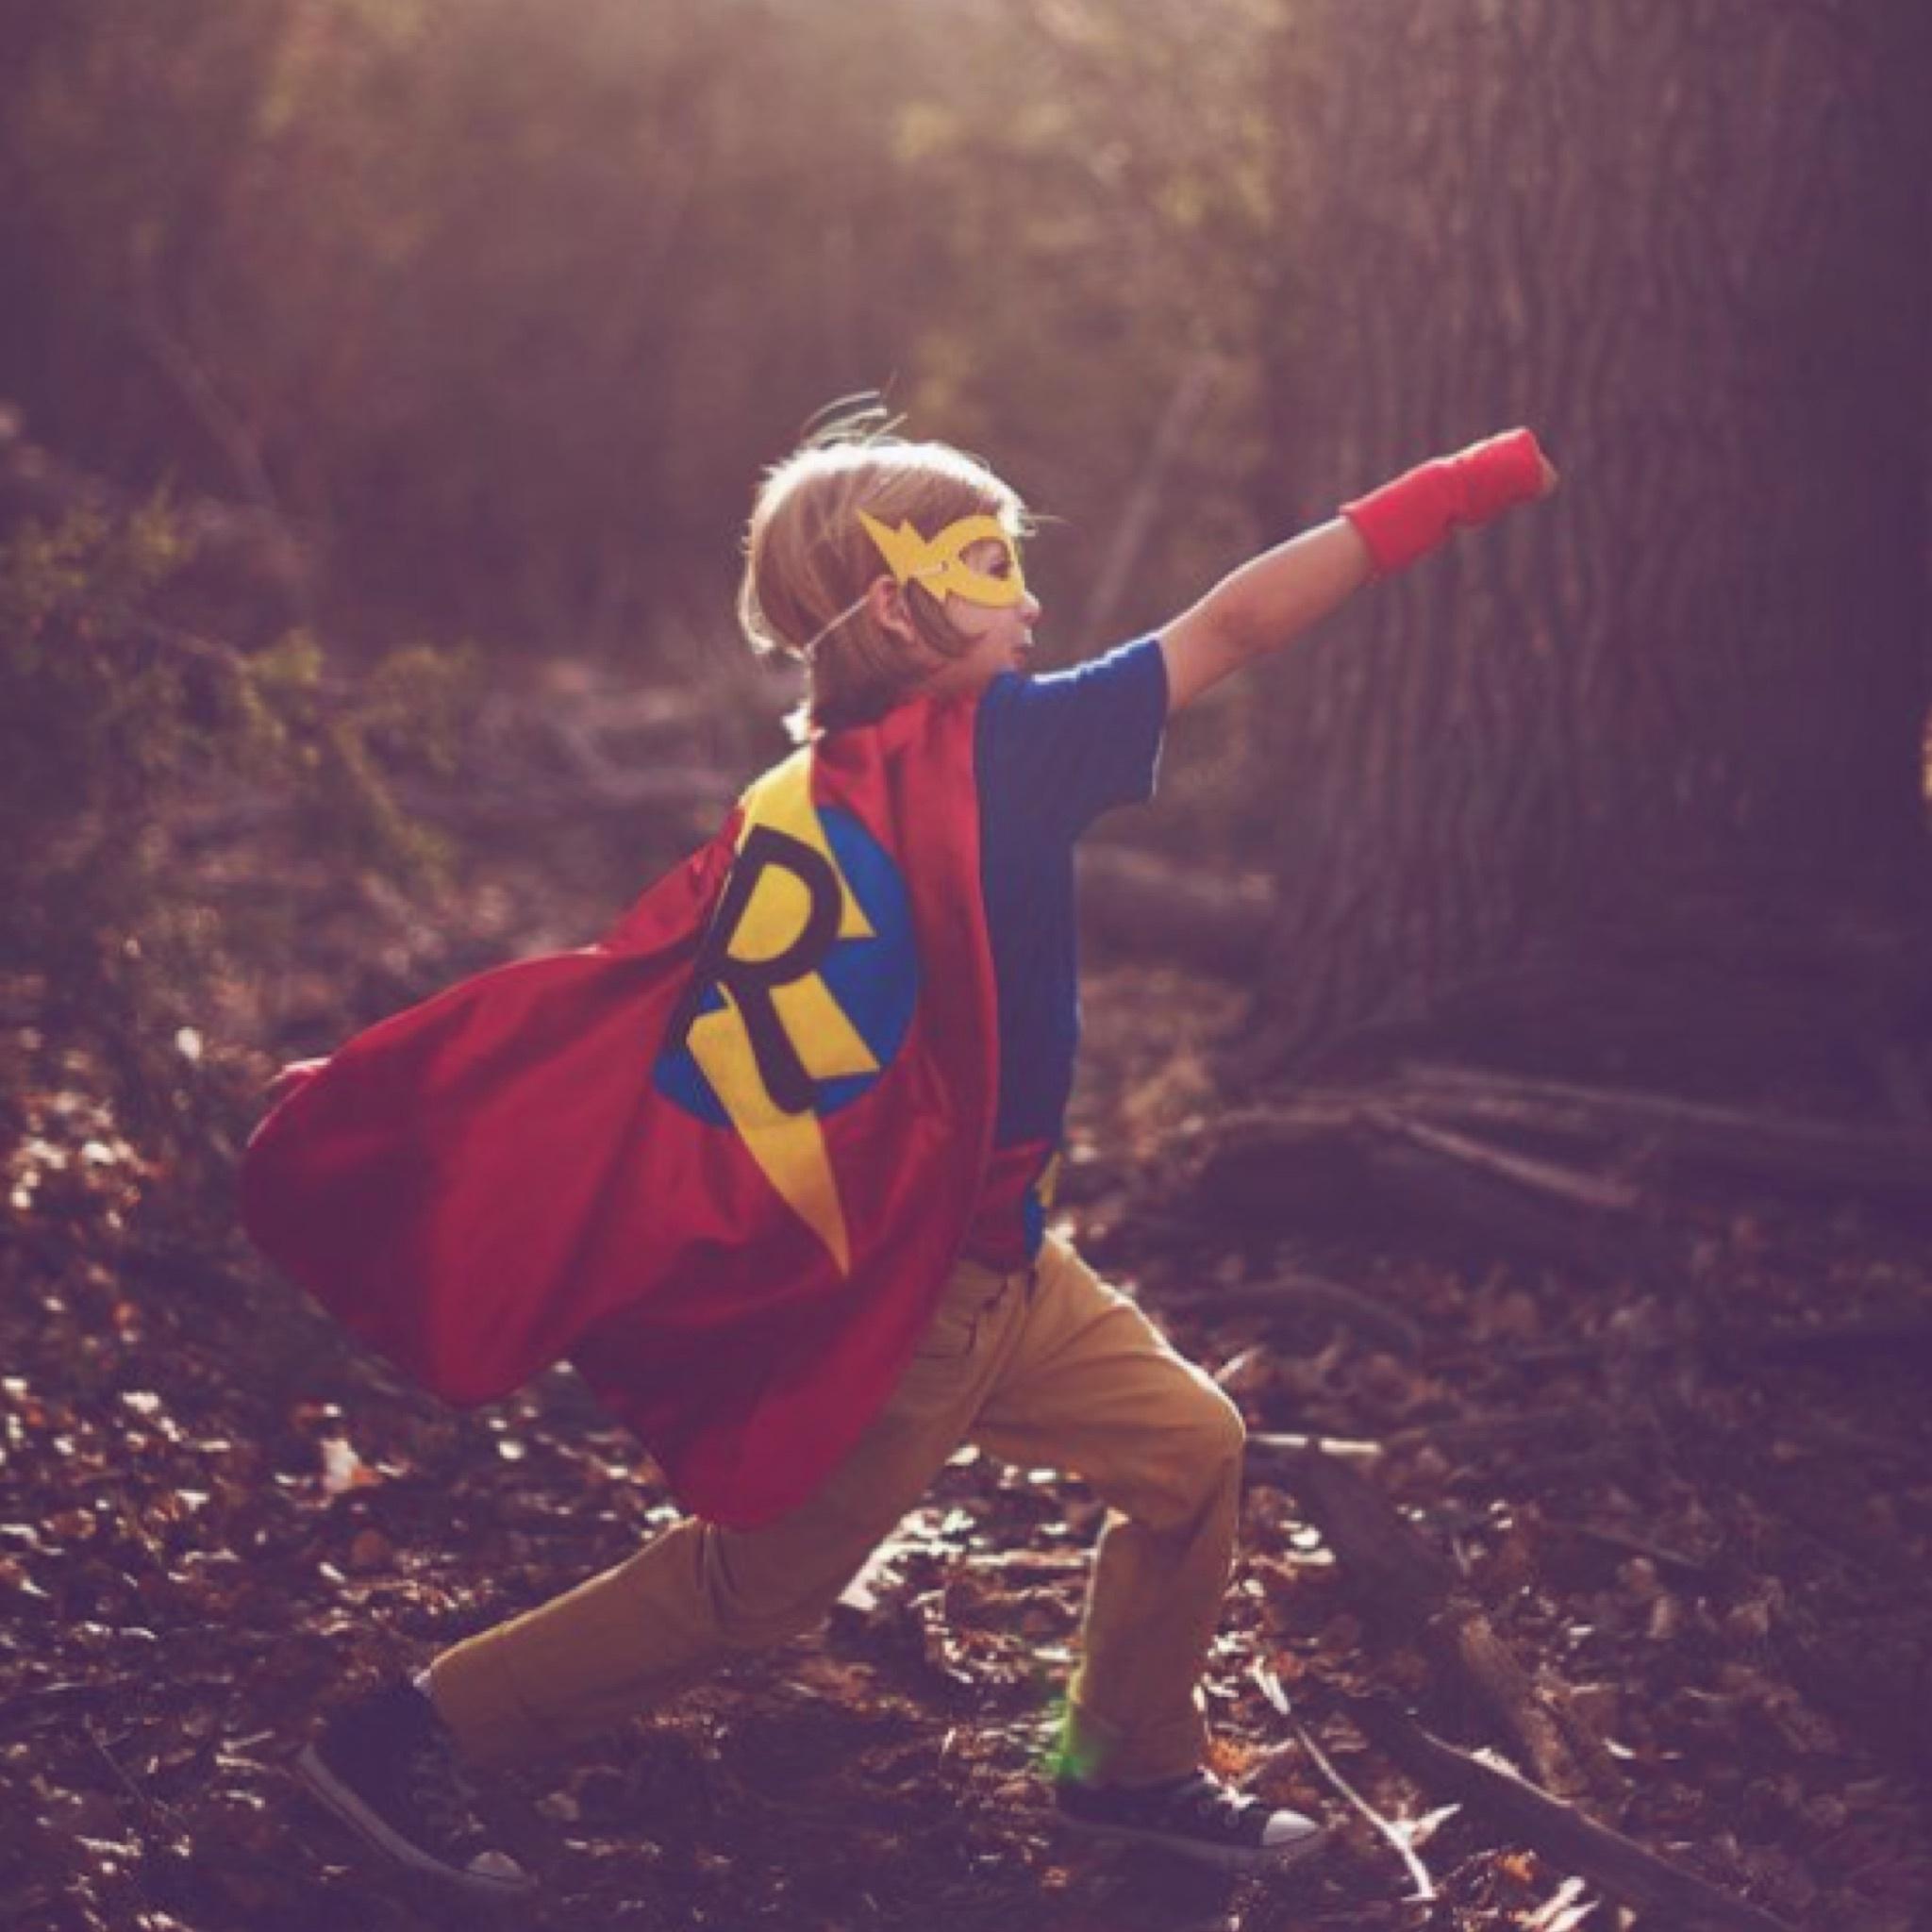 SUPER HERO PARTY SQ.jpg